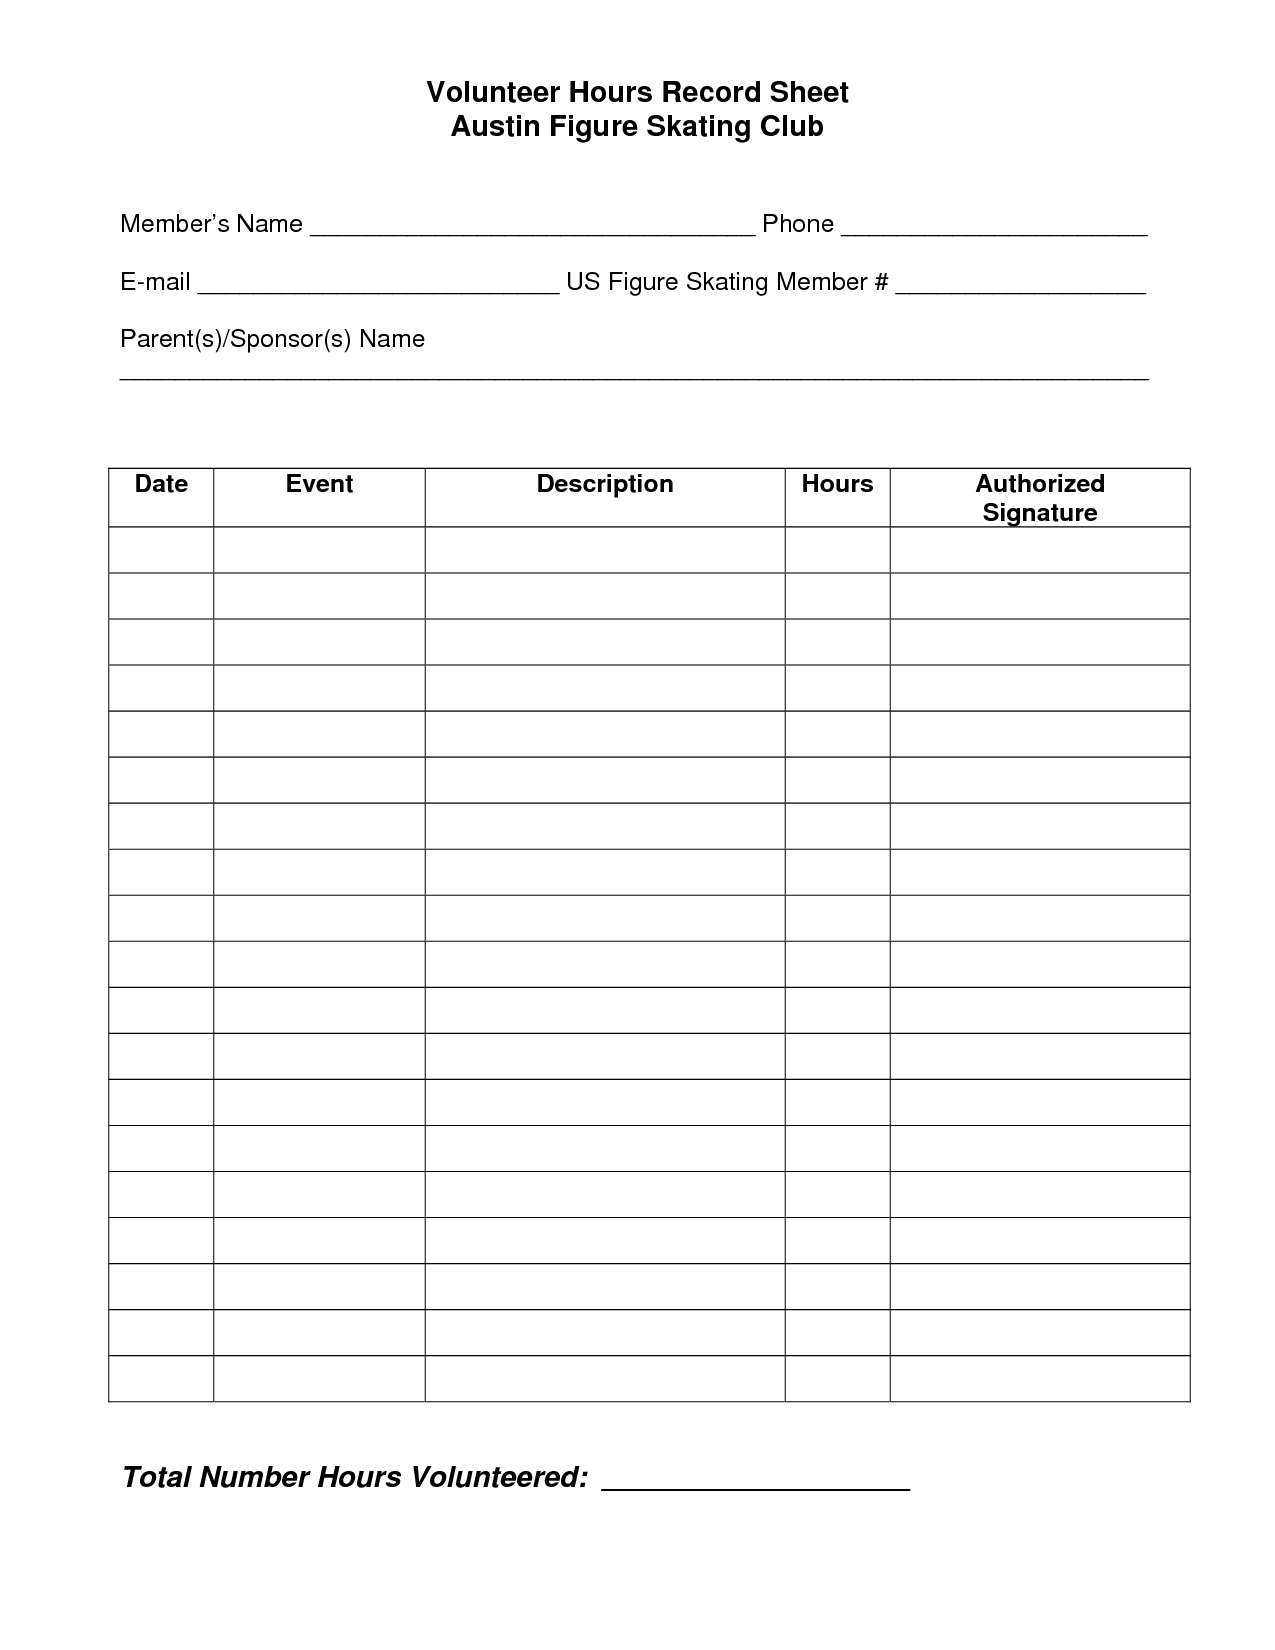 Volunteer Hours Log Sheet Template | Beta Club | Essay Writing Tips - Free Printable Community Service Log Sheet